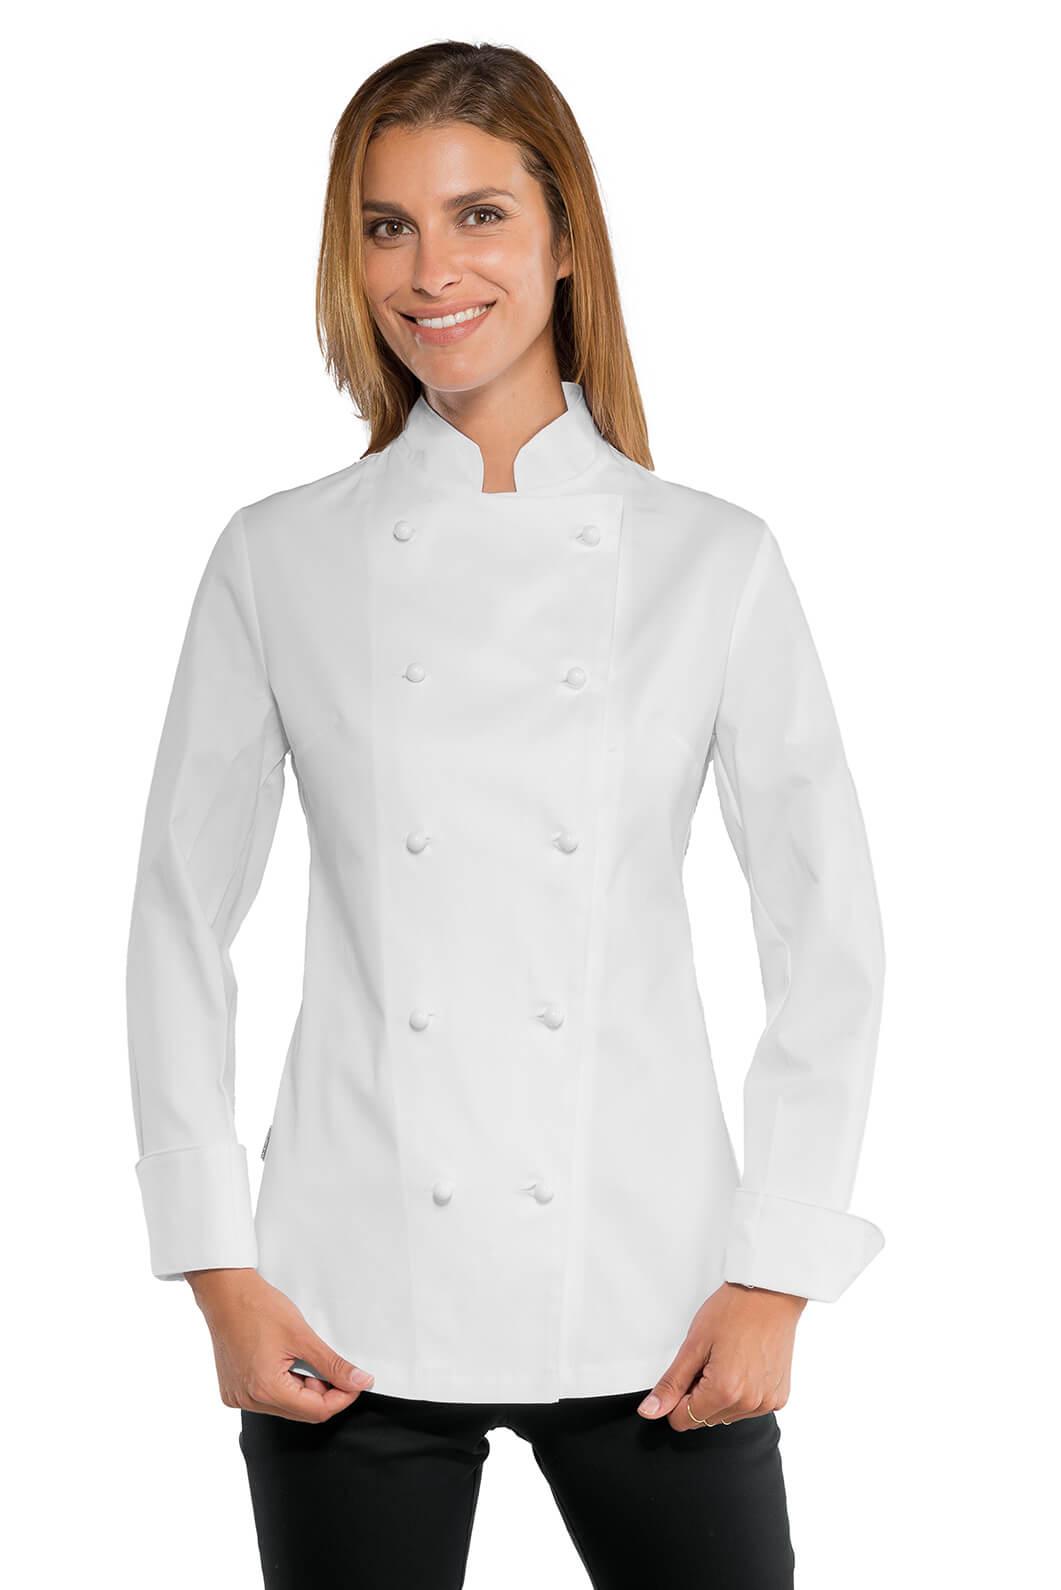 ISACCO Veste blanche de cuisine Lady Chef Stretch